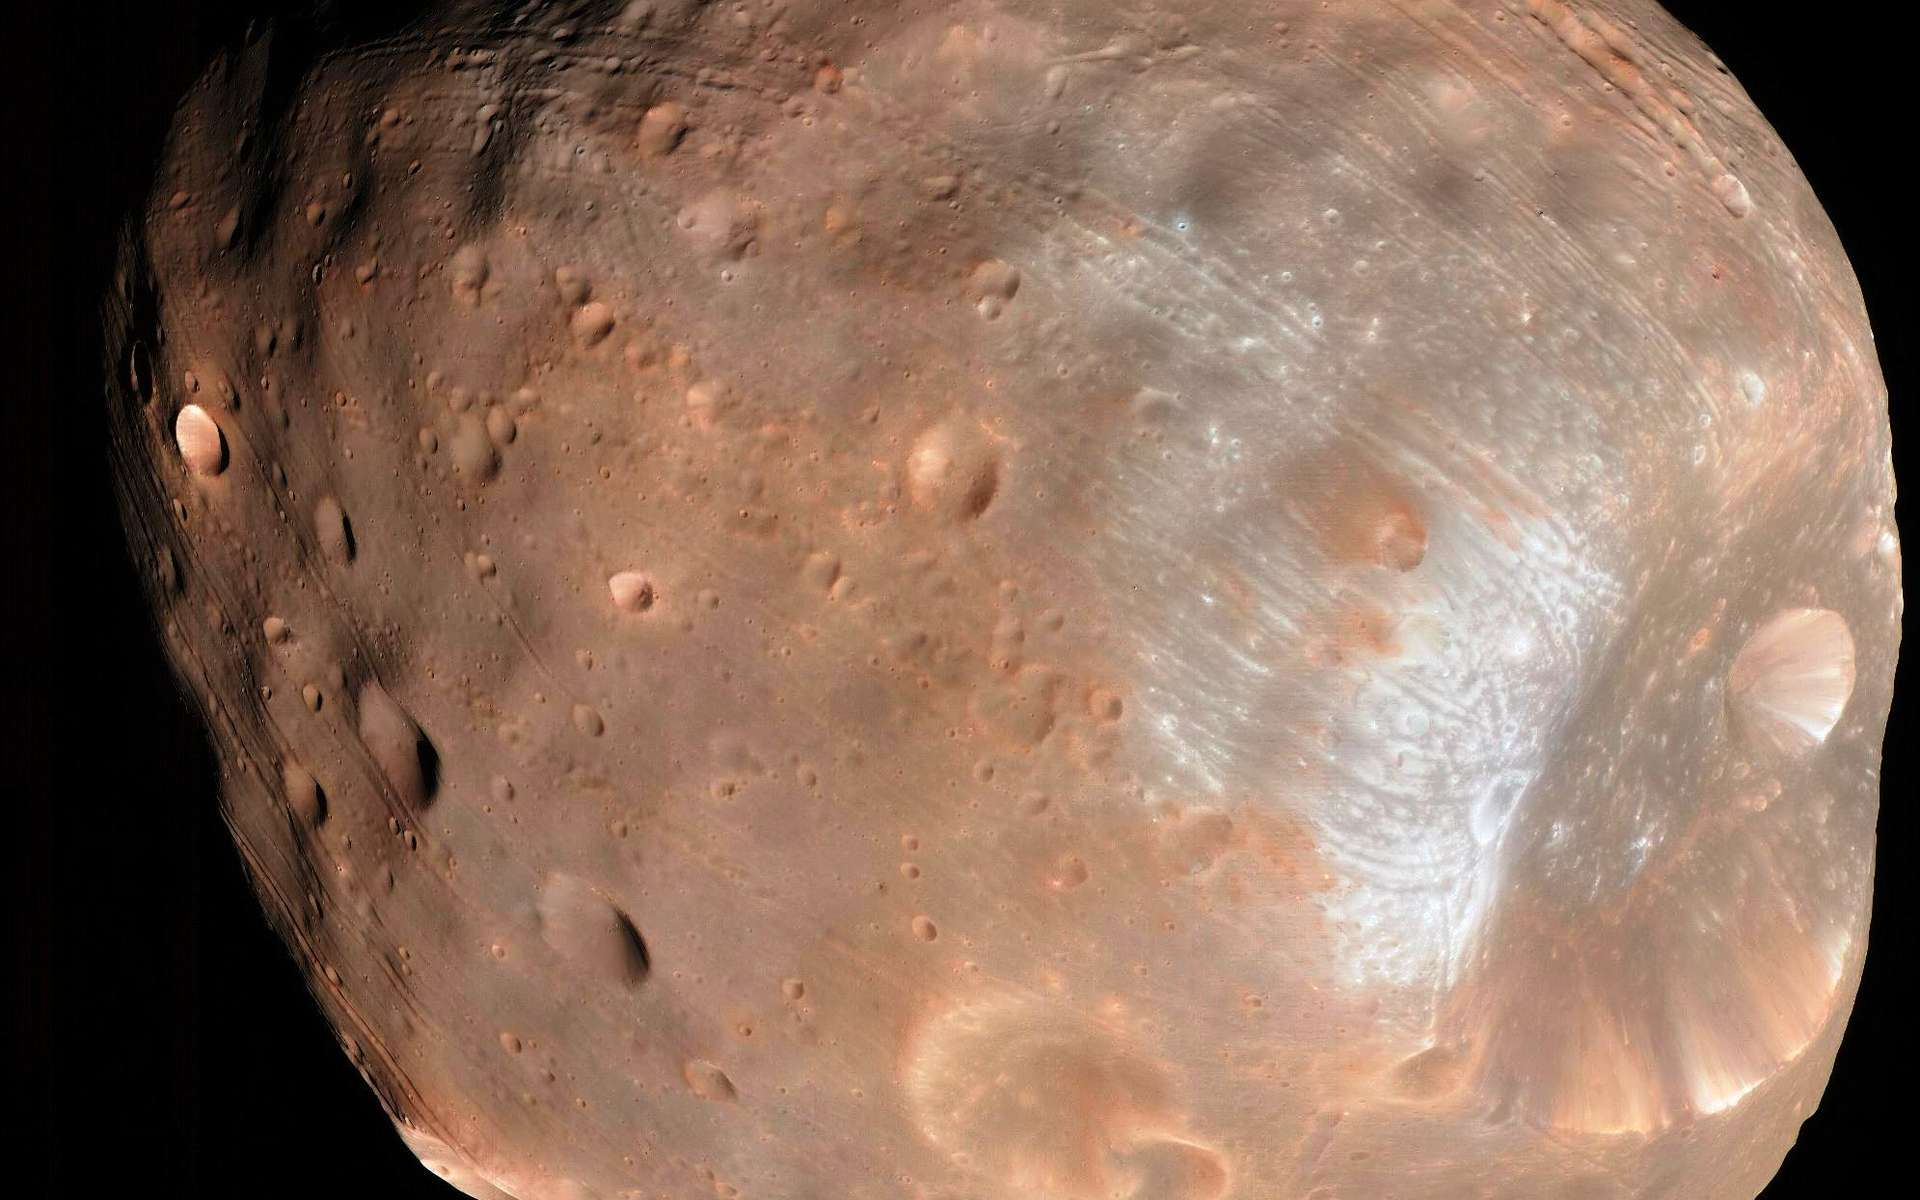 La surface de Phobos, une des lunes de Mars. © Nasa, JPL-Caltech, University of Arizona